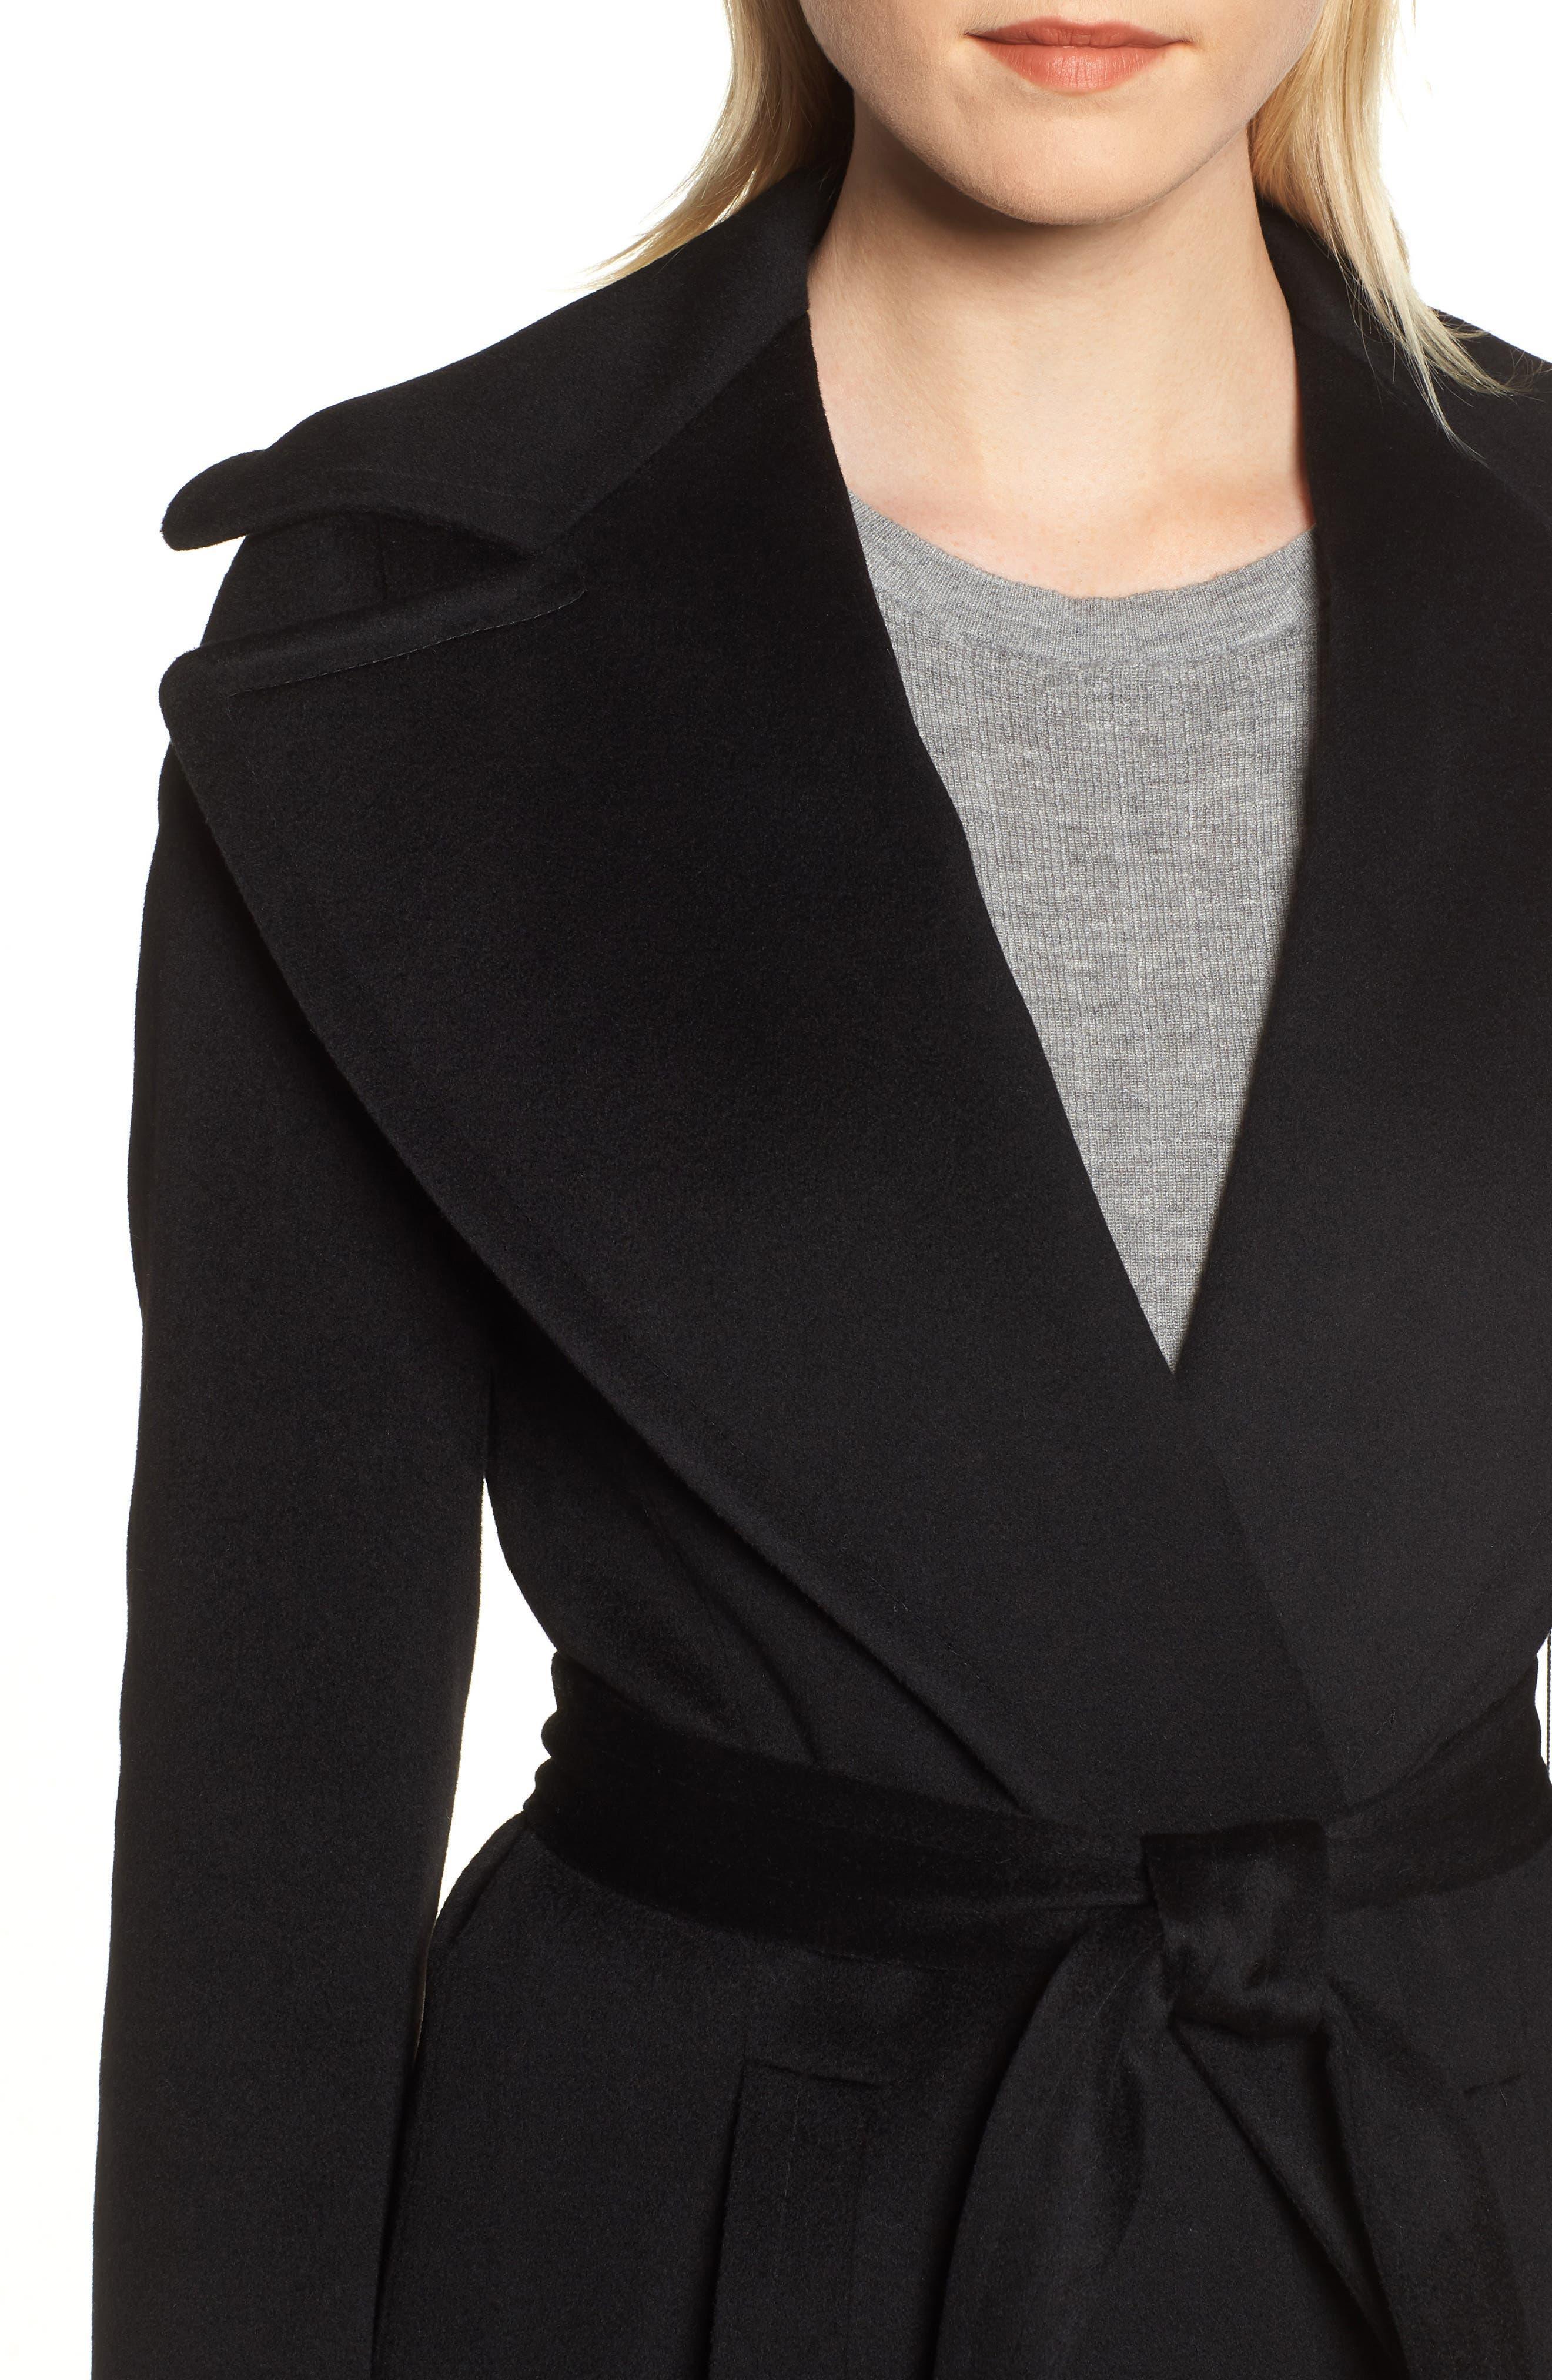 FLEURETTE, Loro Piana Wool Wrap Coat, Alternate thumbnail 5, color, 001